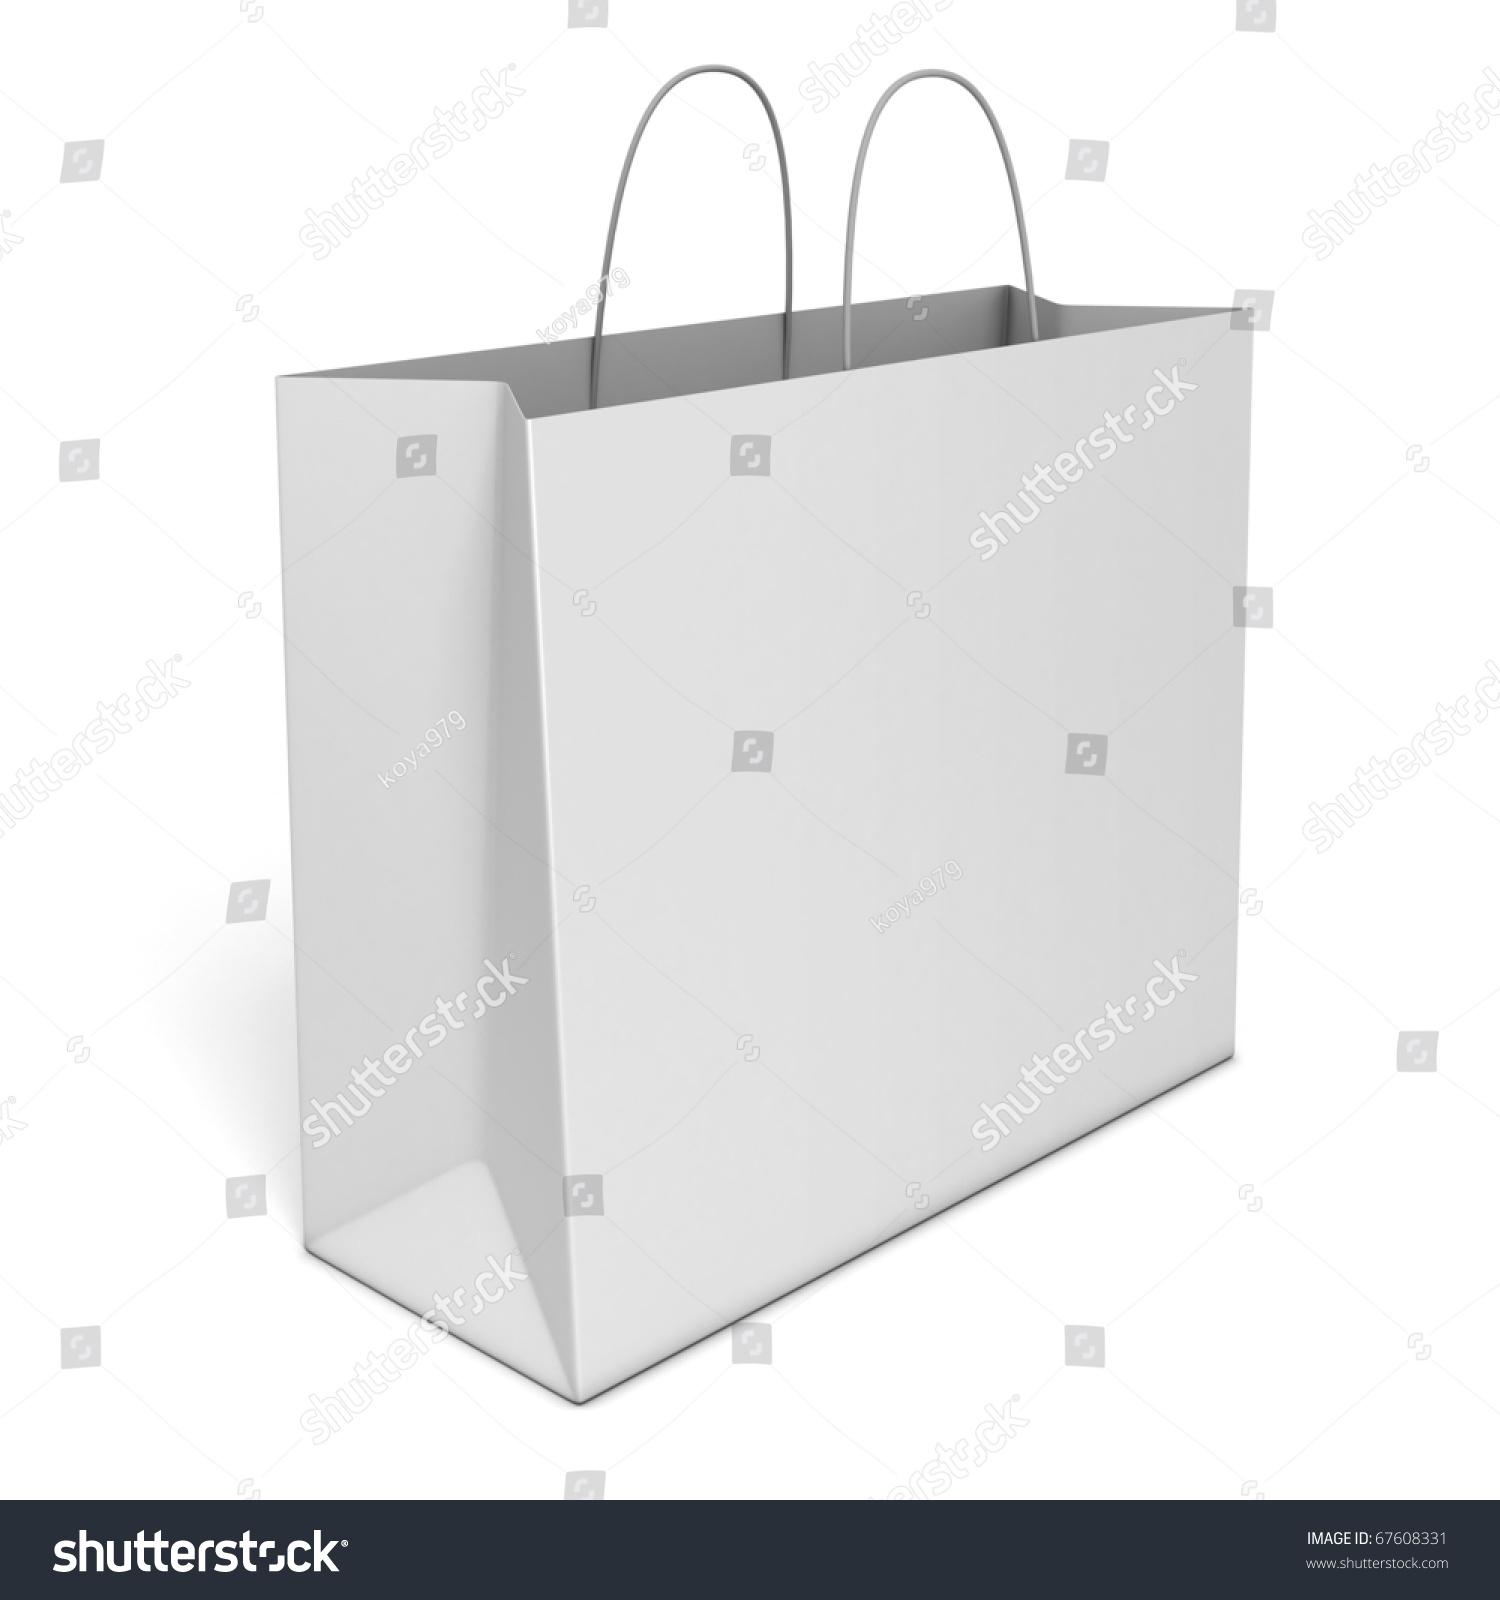 Blank Shopping Bag Isolated Over White Background Stock Photo ...